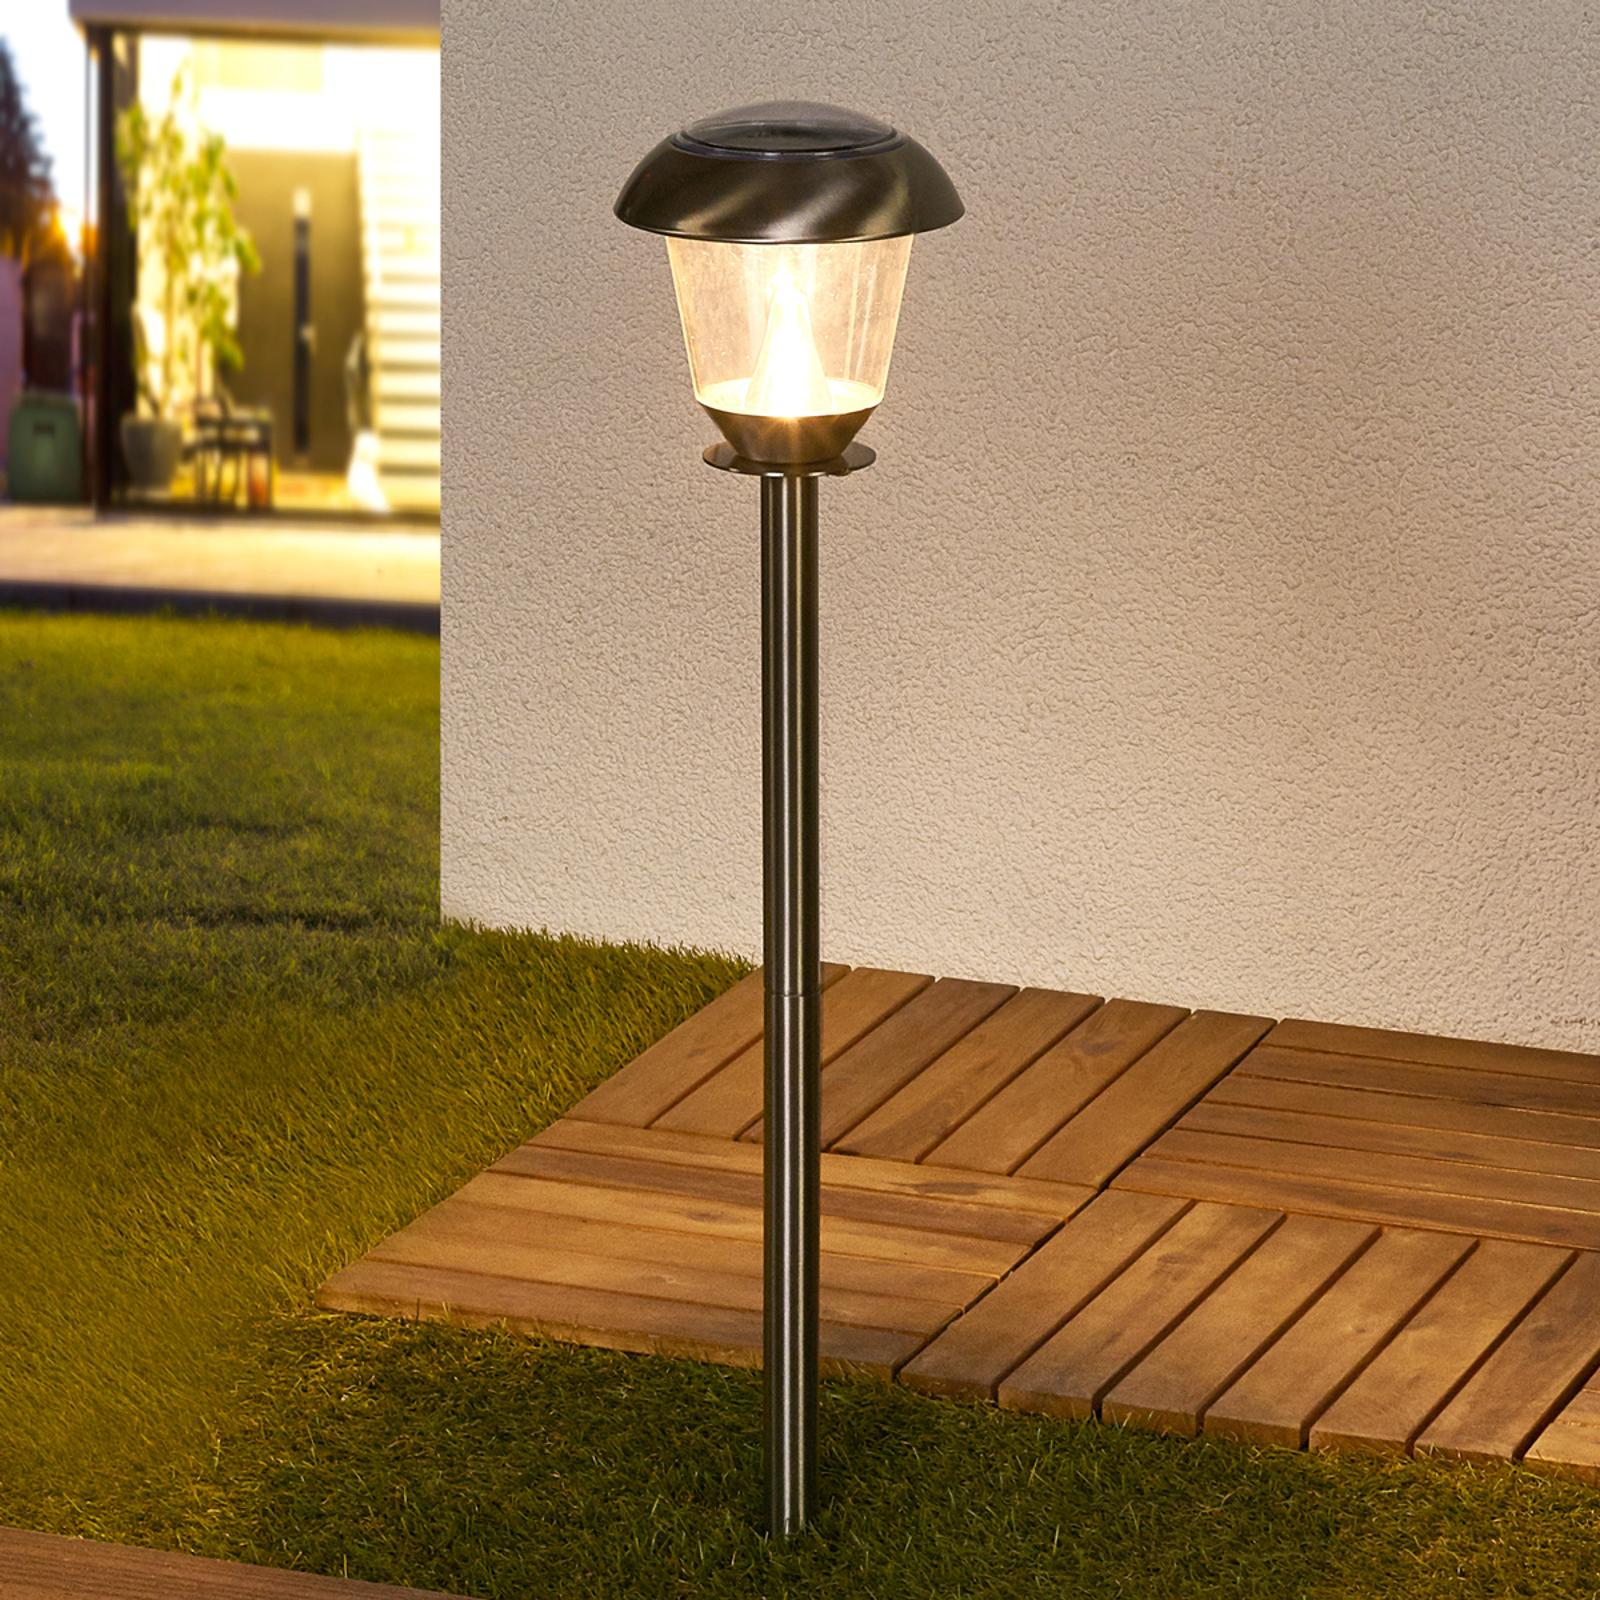 Lampa solarna LED Nela do ogrodu